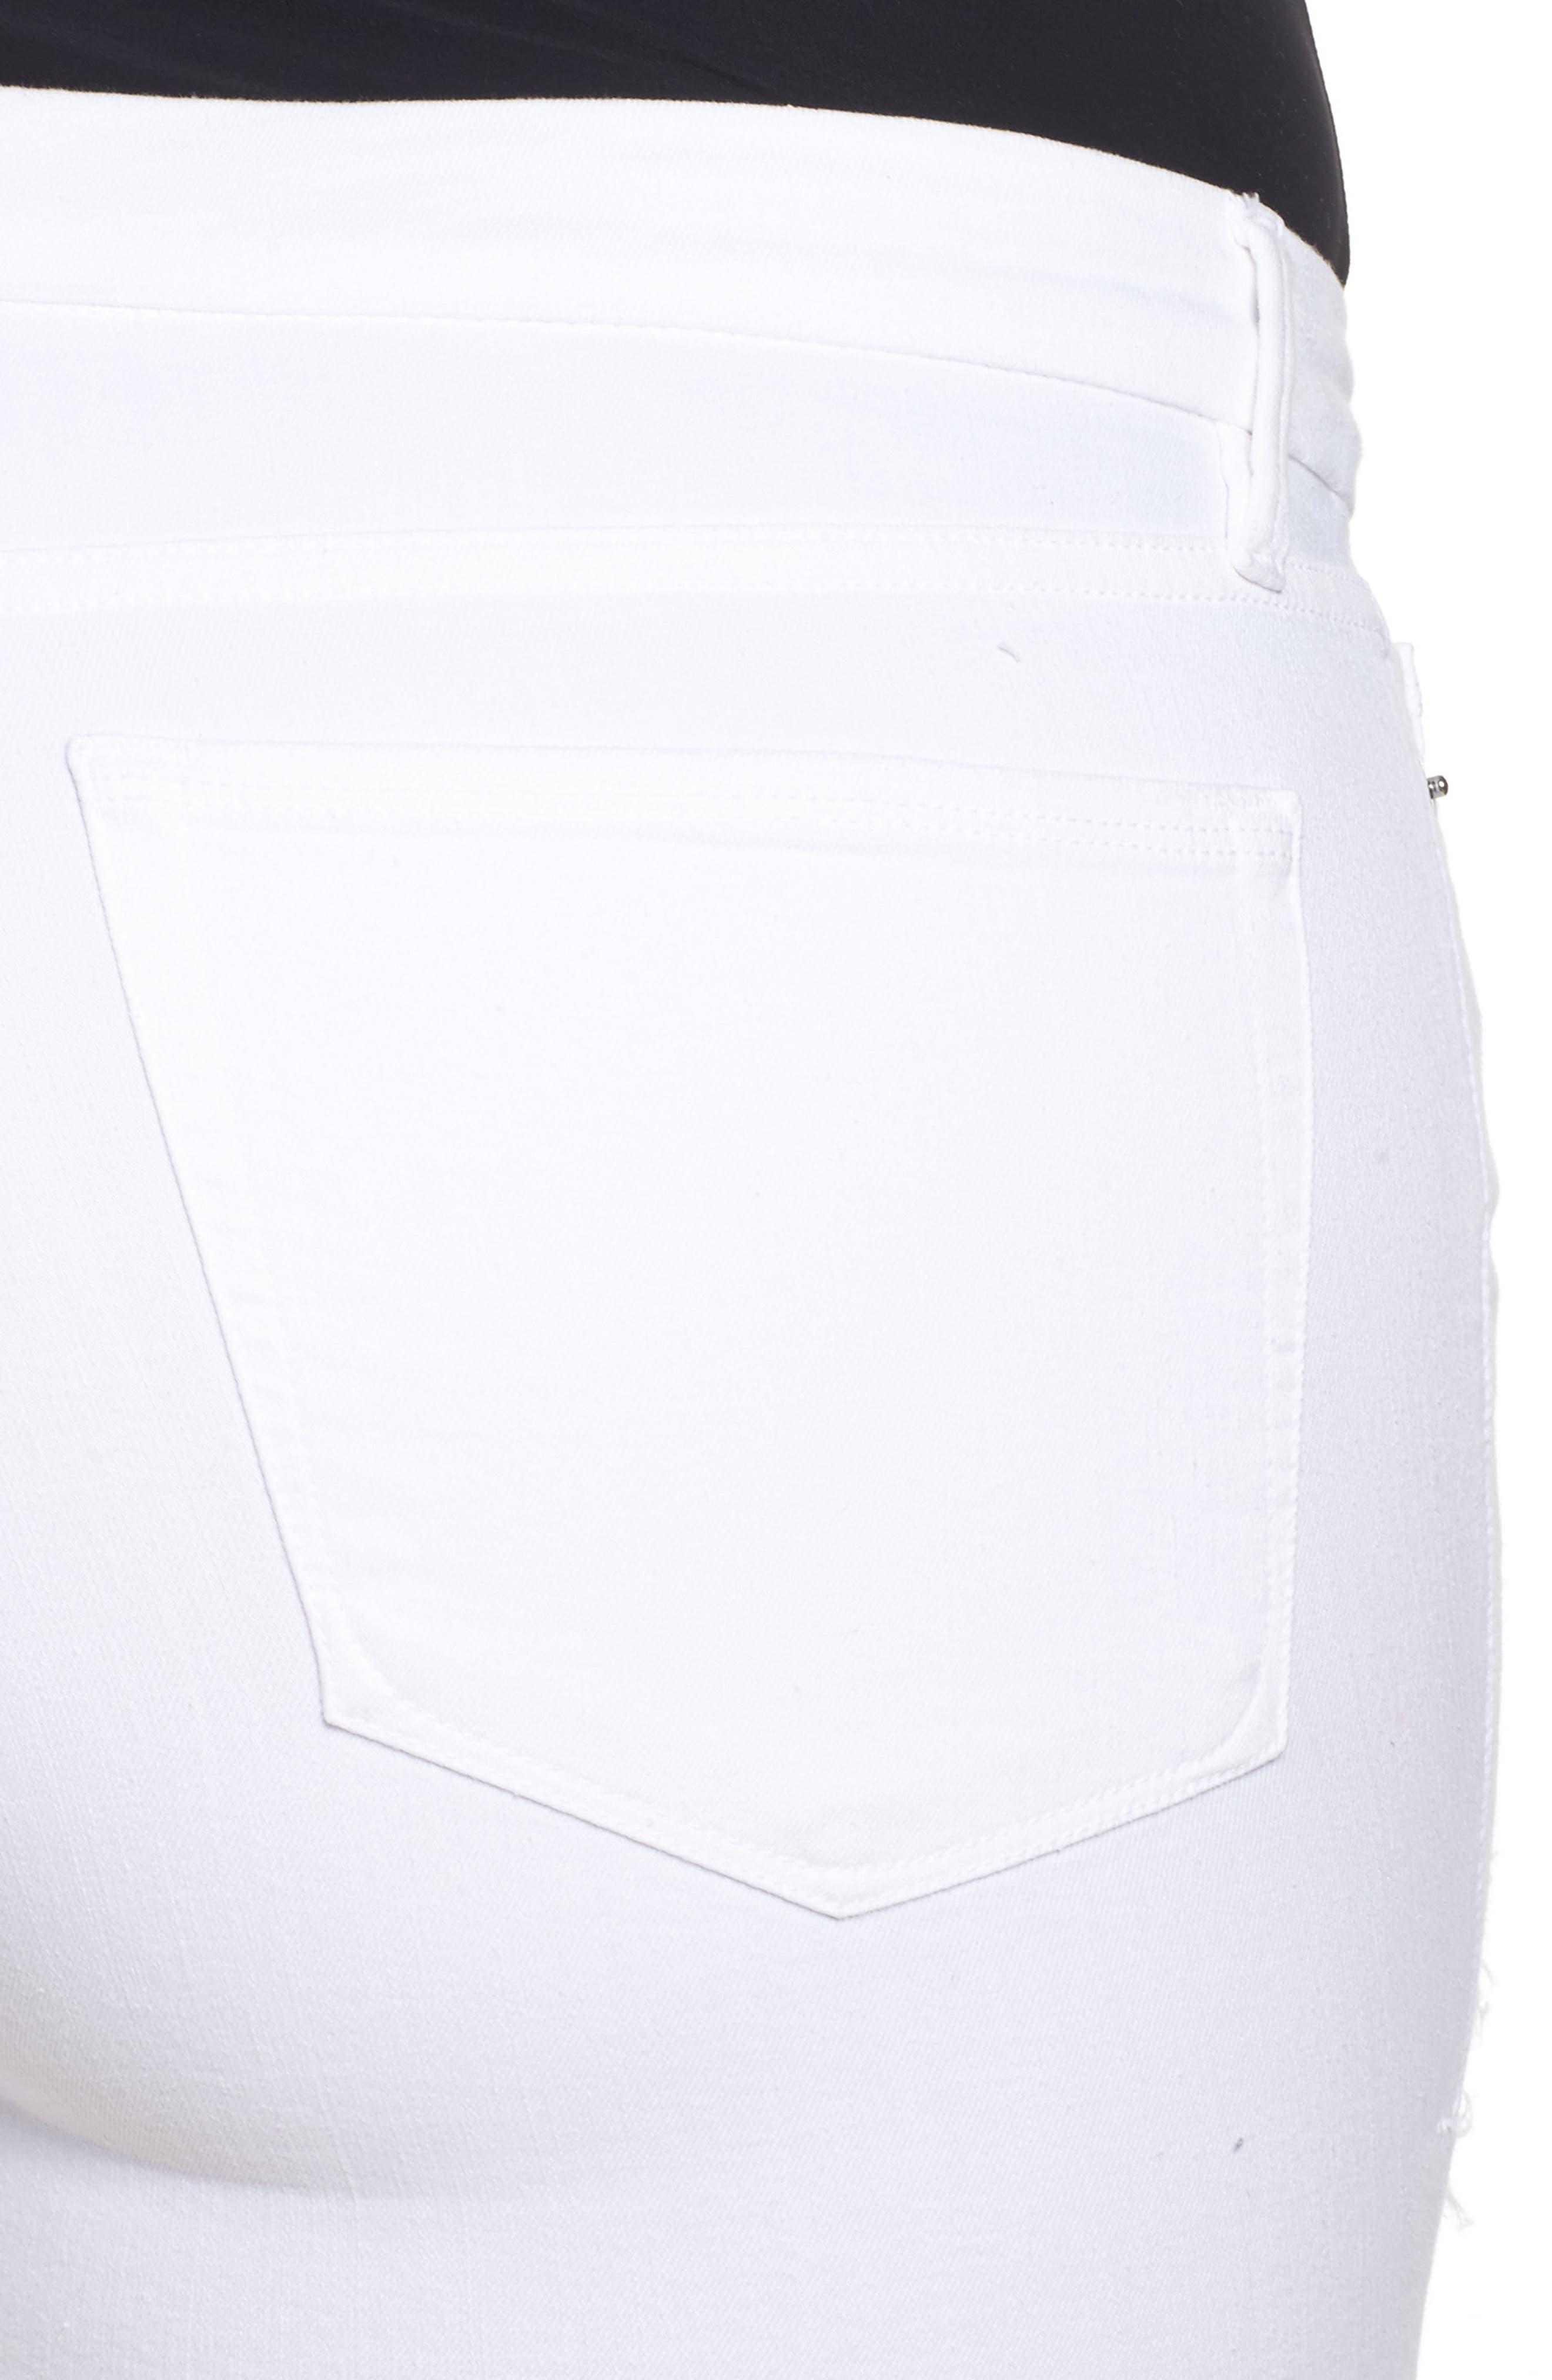 Destroyed Cutoff Denim Shorts,                             Alternate thumbnail 11, color,                             White 004